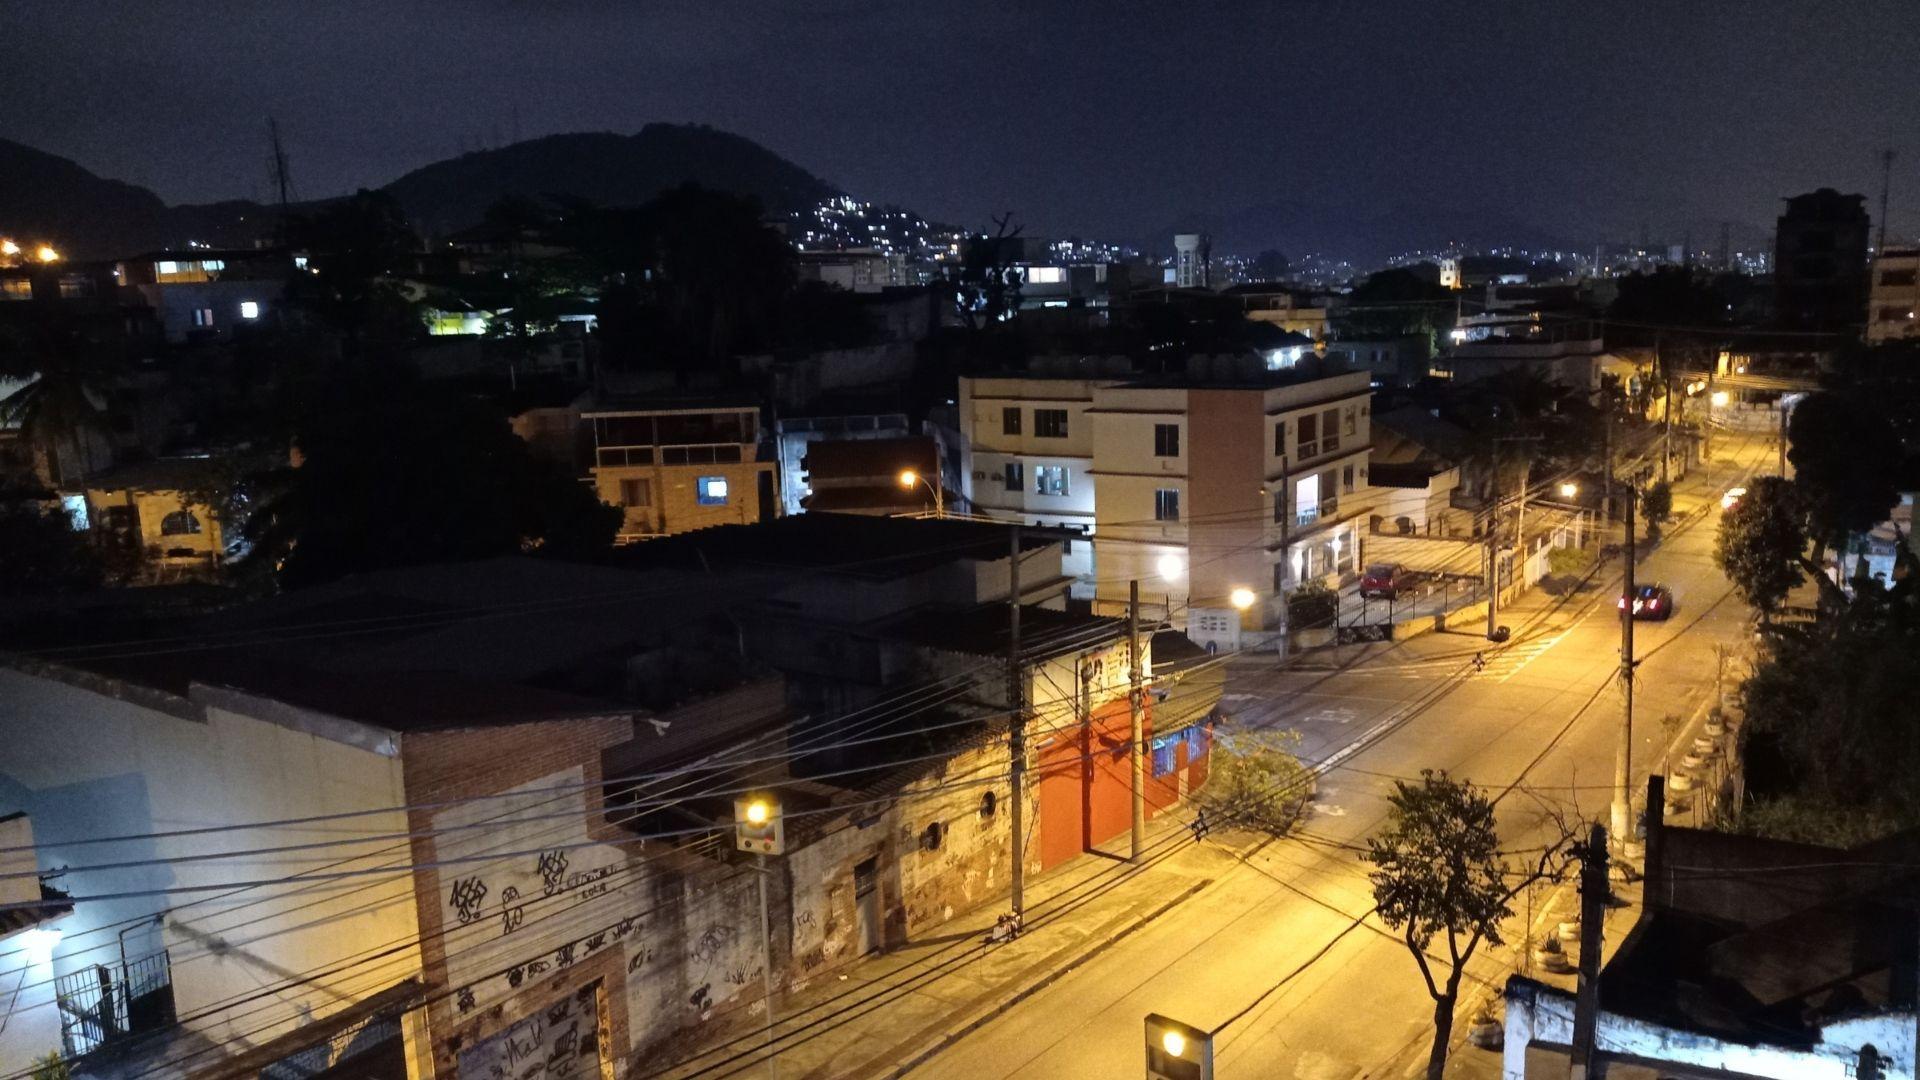 Foto tirada à noite pelo Redmi Note 9 (Foto: Zoom)